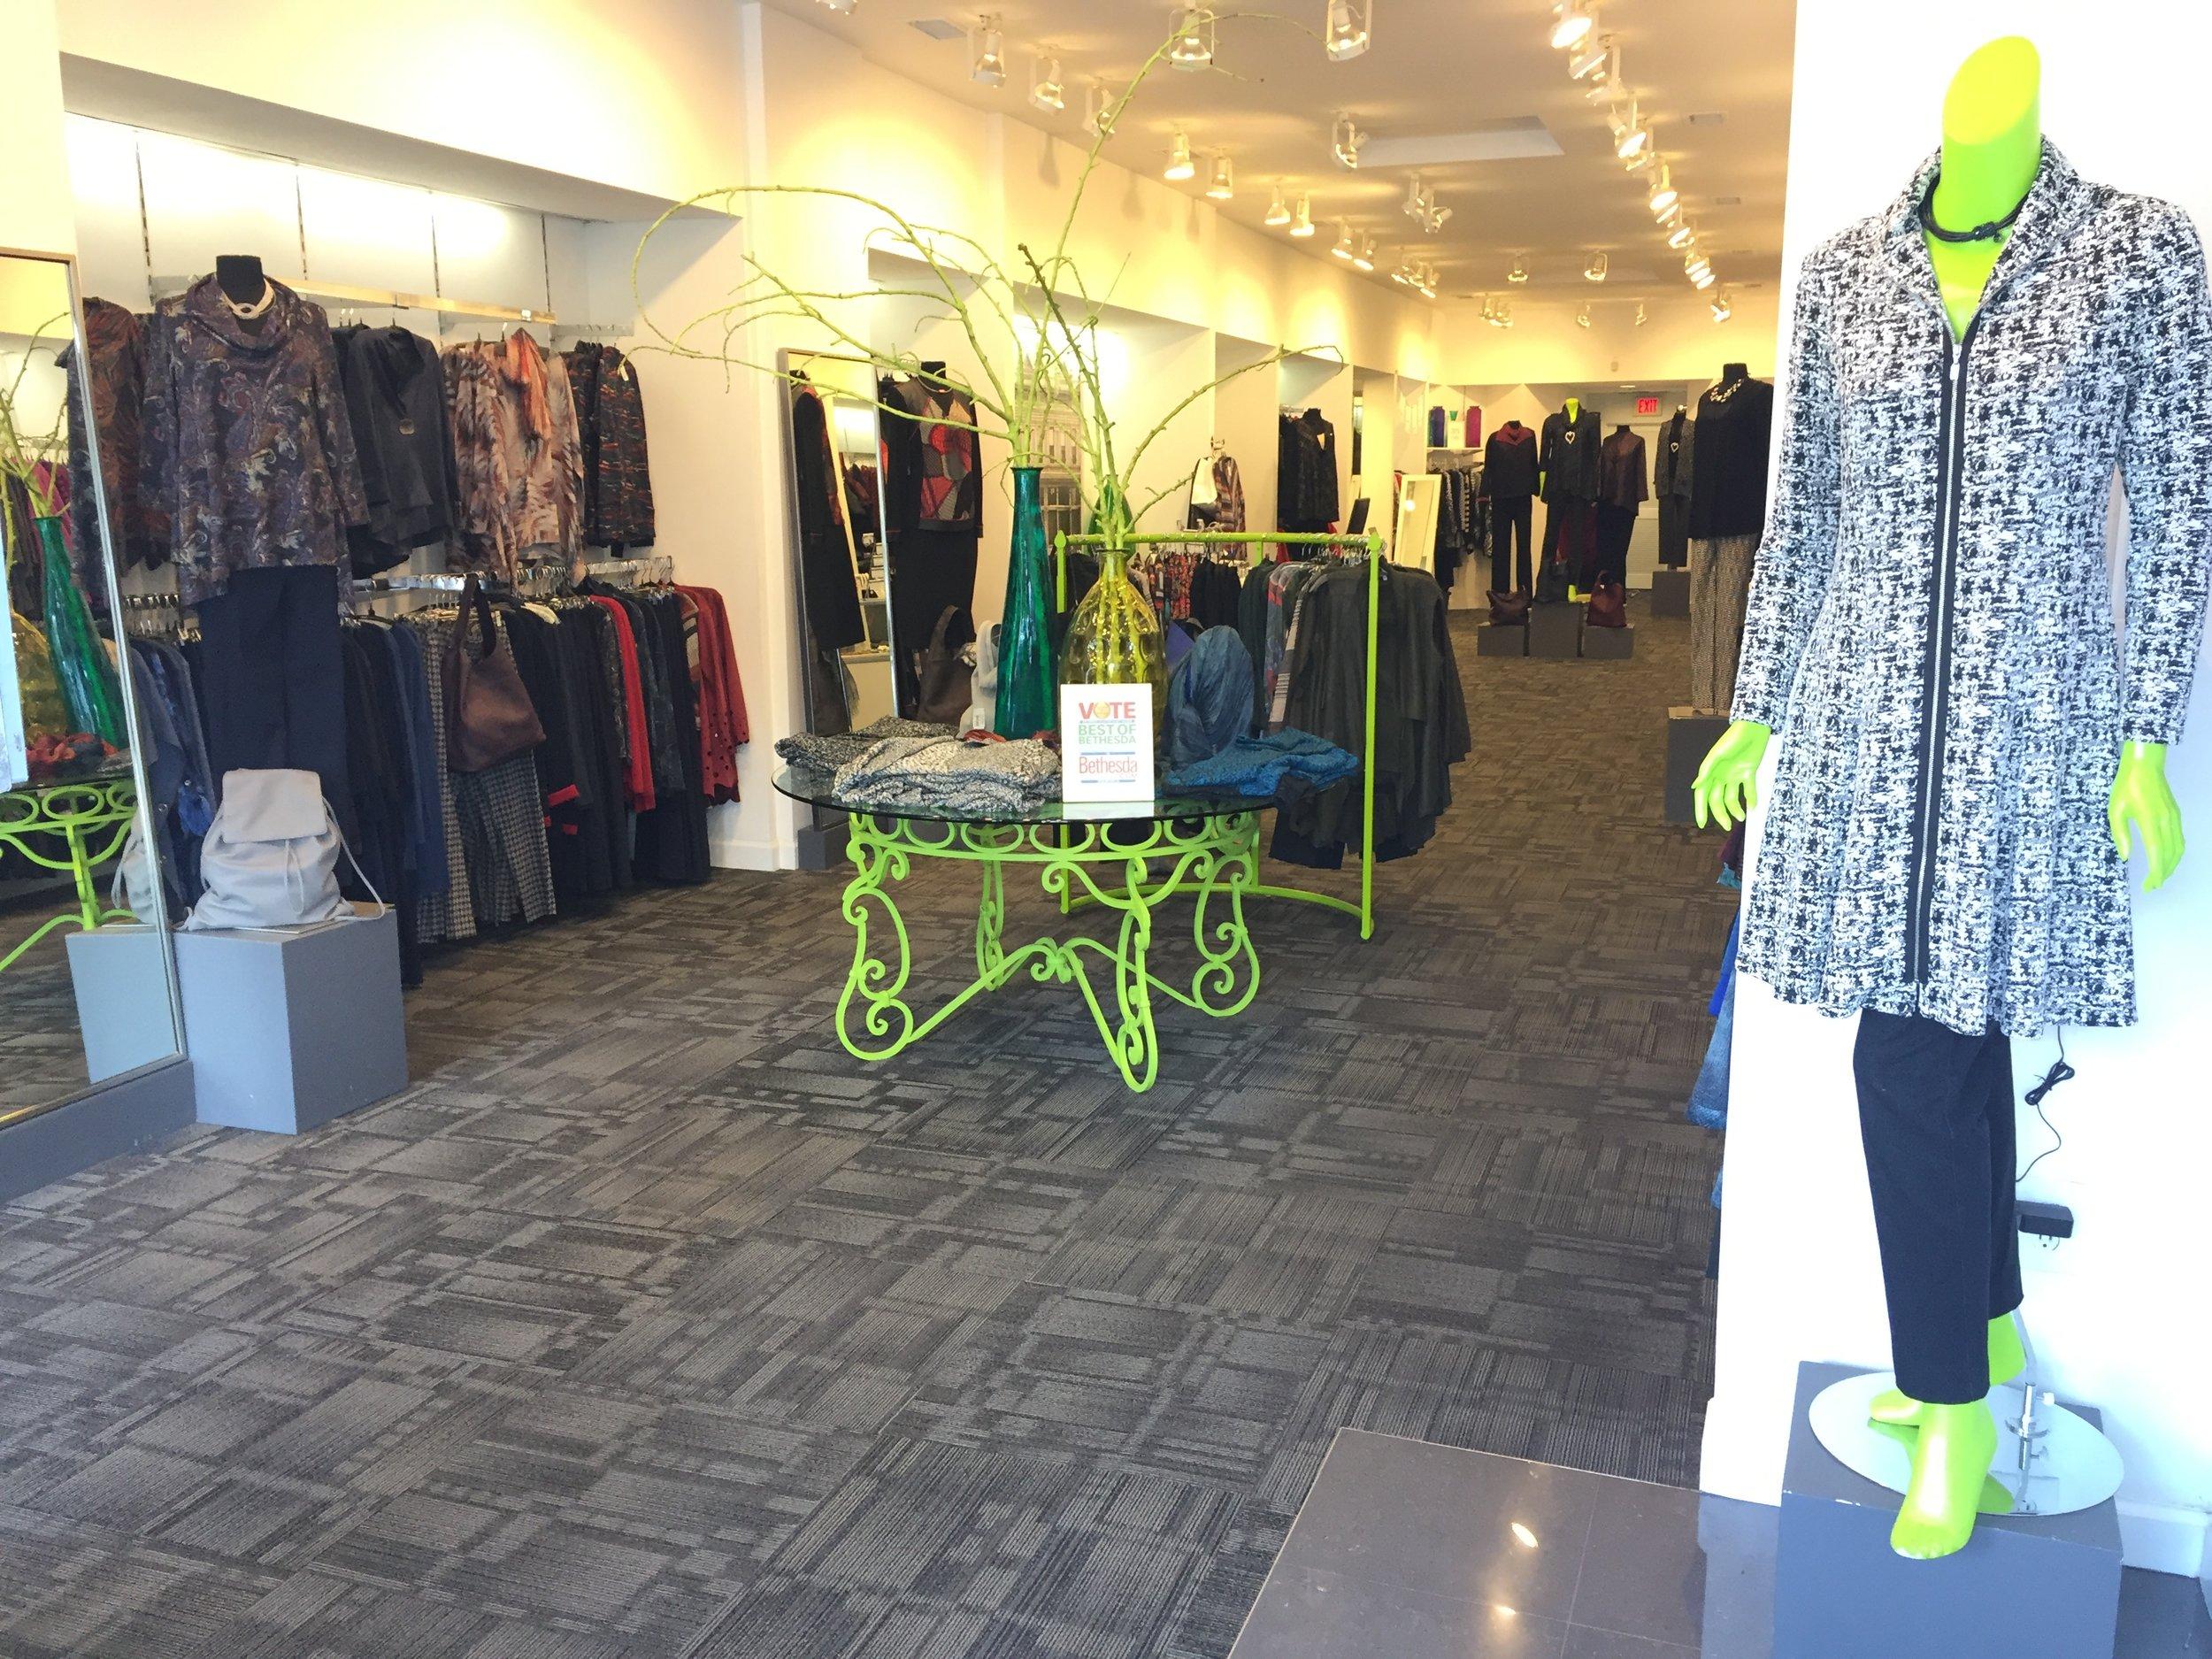 HADLEE - Shops at Wildwood10303 Old Georgetown RdBethesda, MD 20814 301.530.2643hadlee@justperfectcollection.com